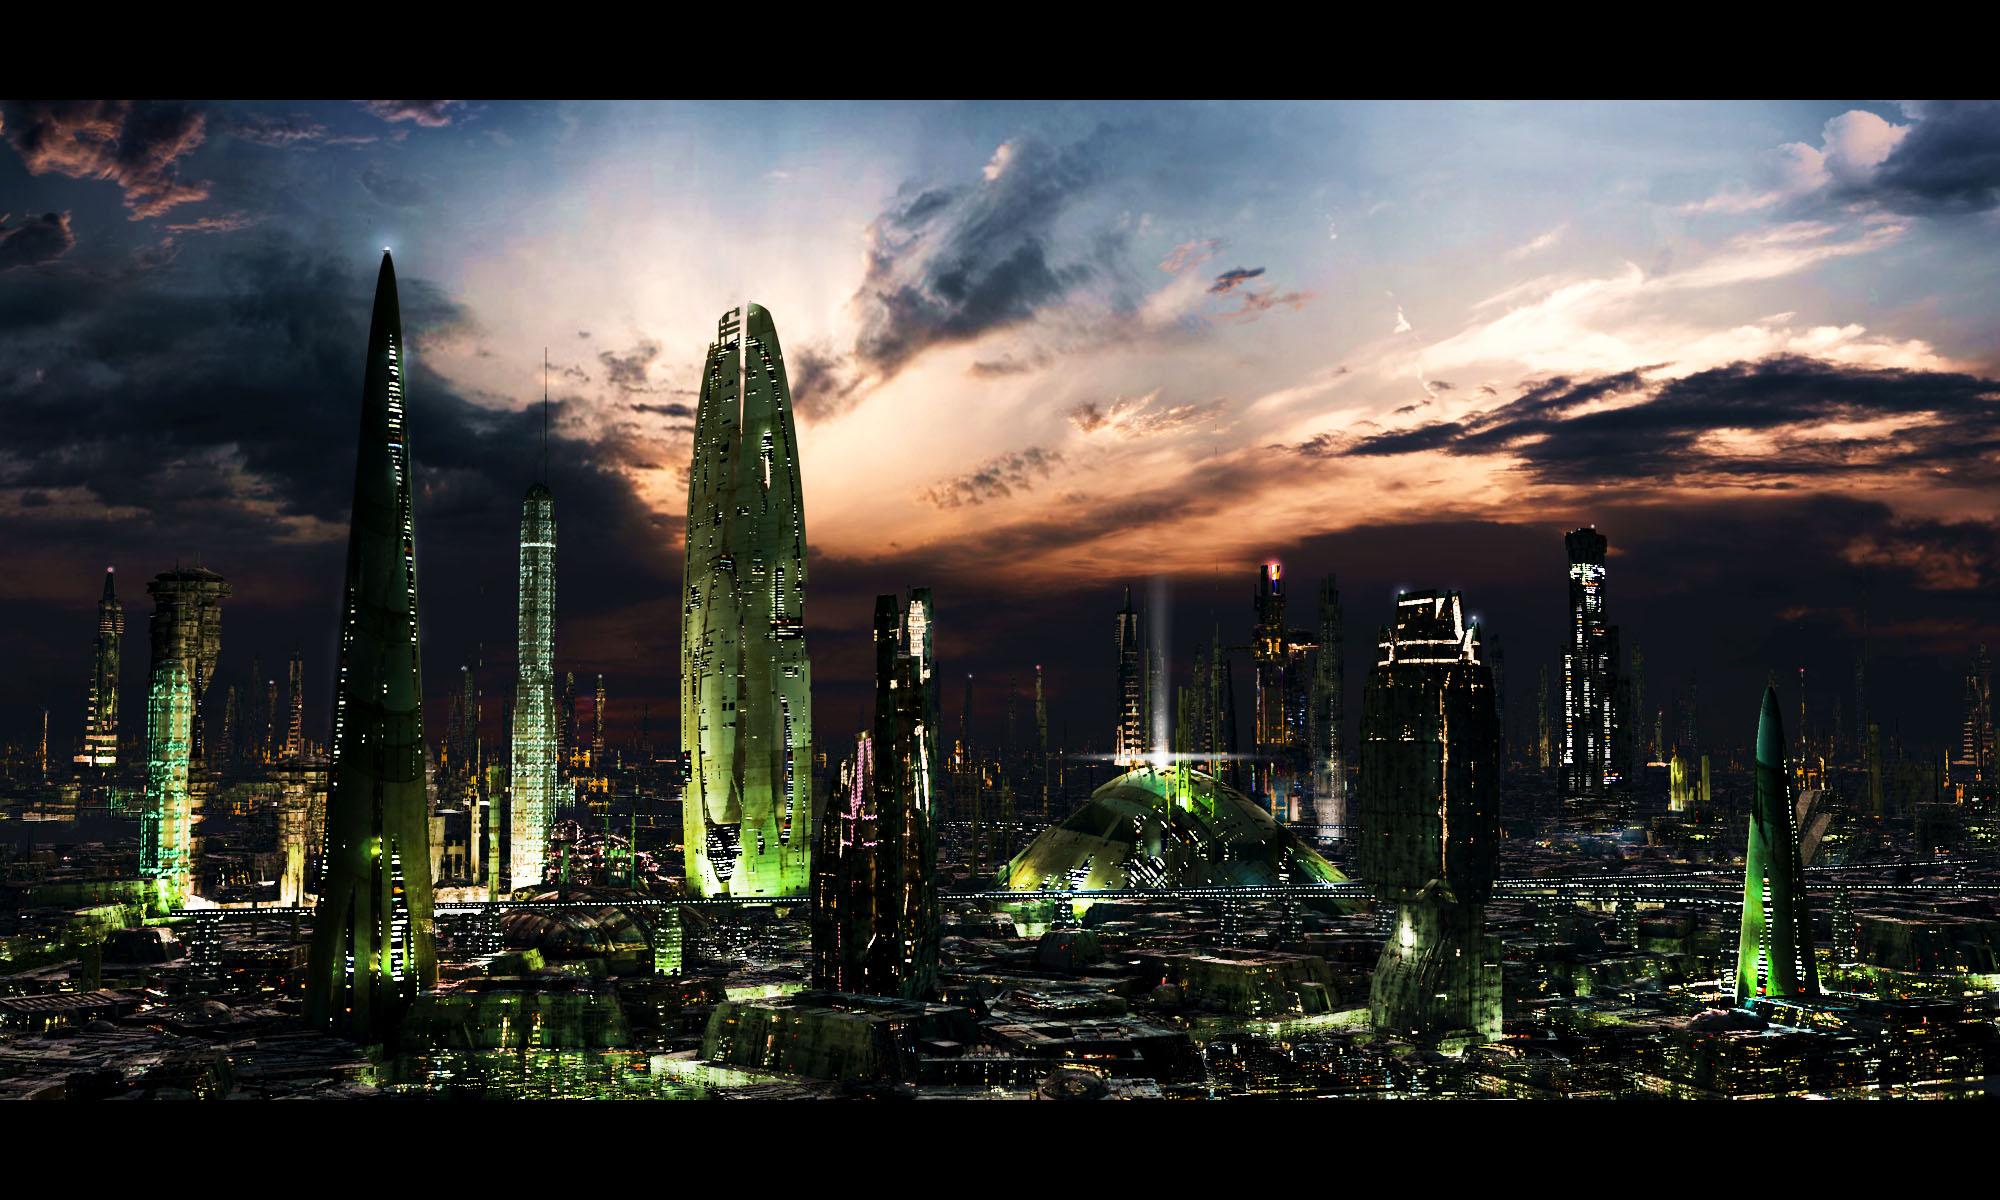 Futuristic City 3 test